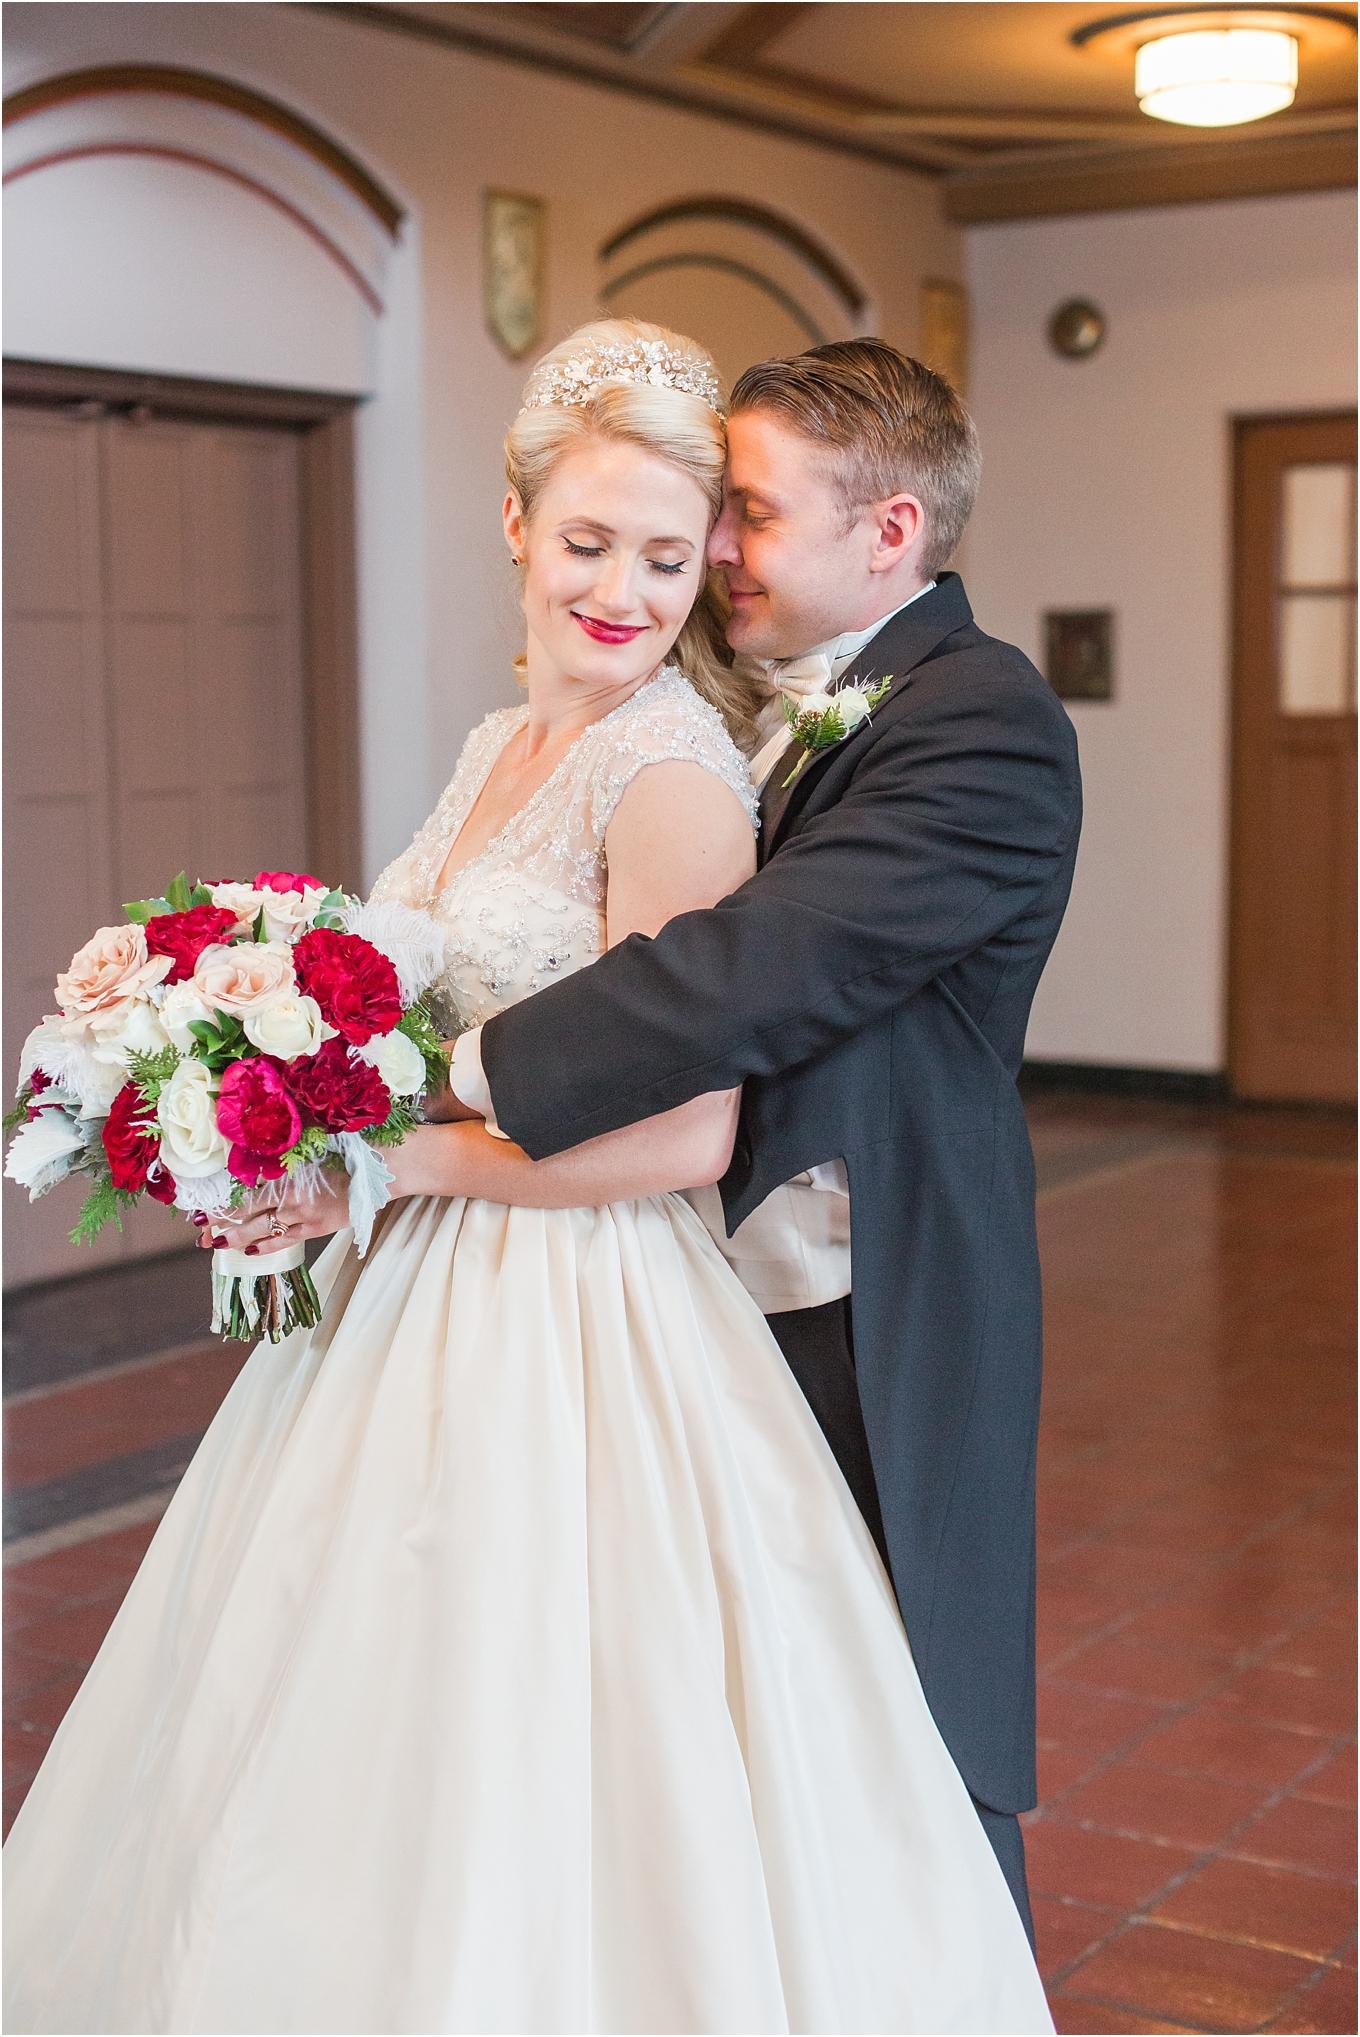 elegant-classic-fairytale-wedding-photos-in-detroit-mi-at-the-masonic-temple-by-courtney-carolyn-photography_0058.jpg